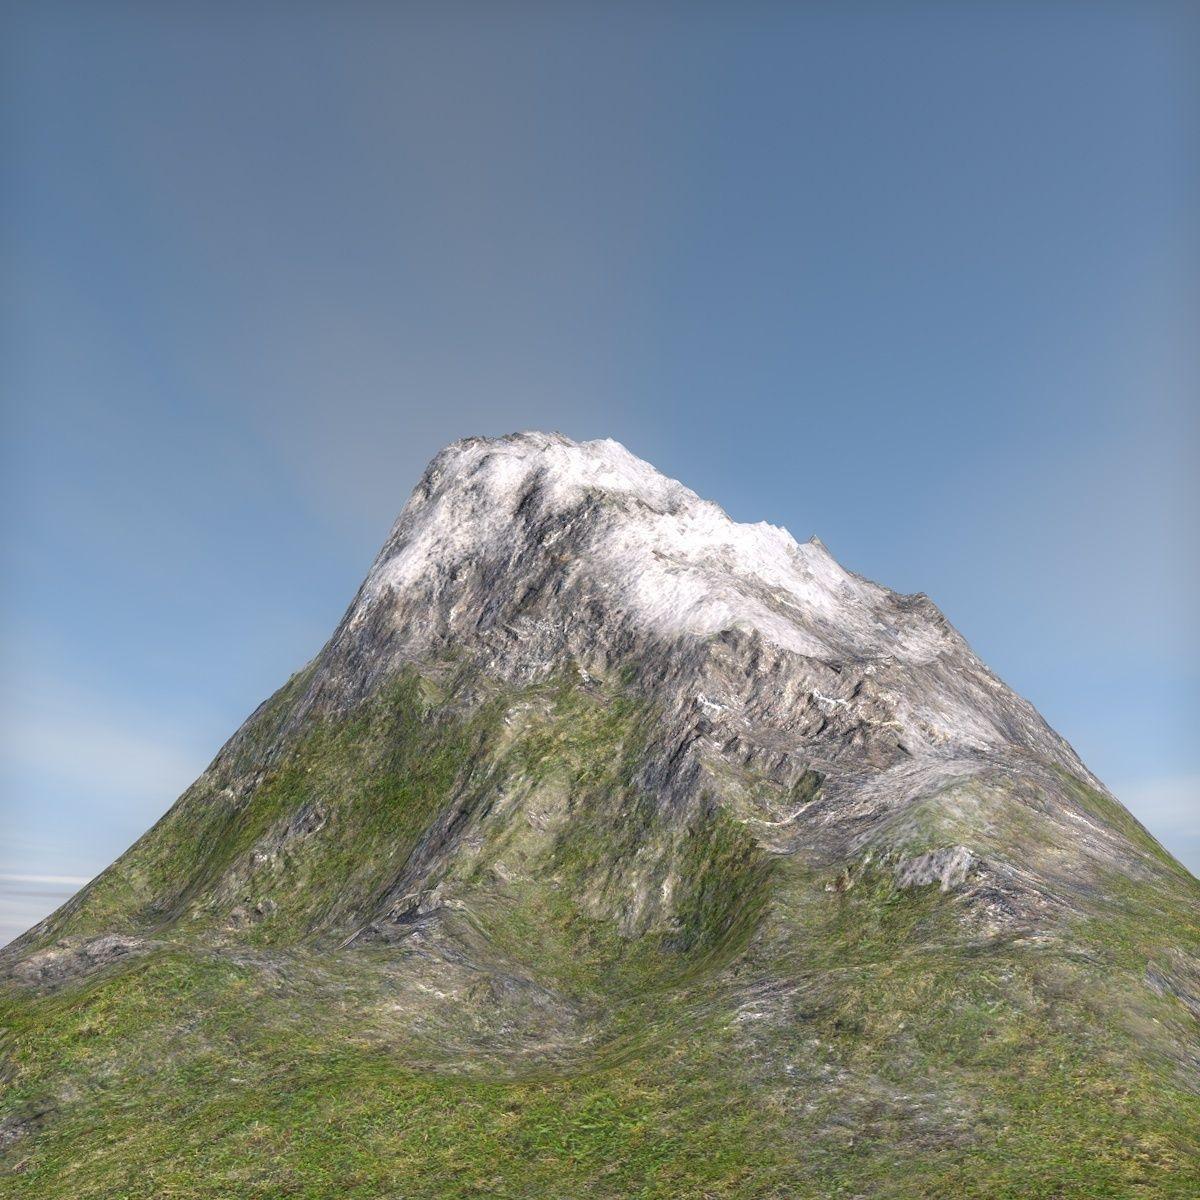 Terrain mountain